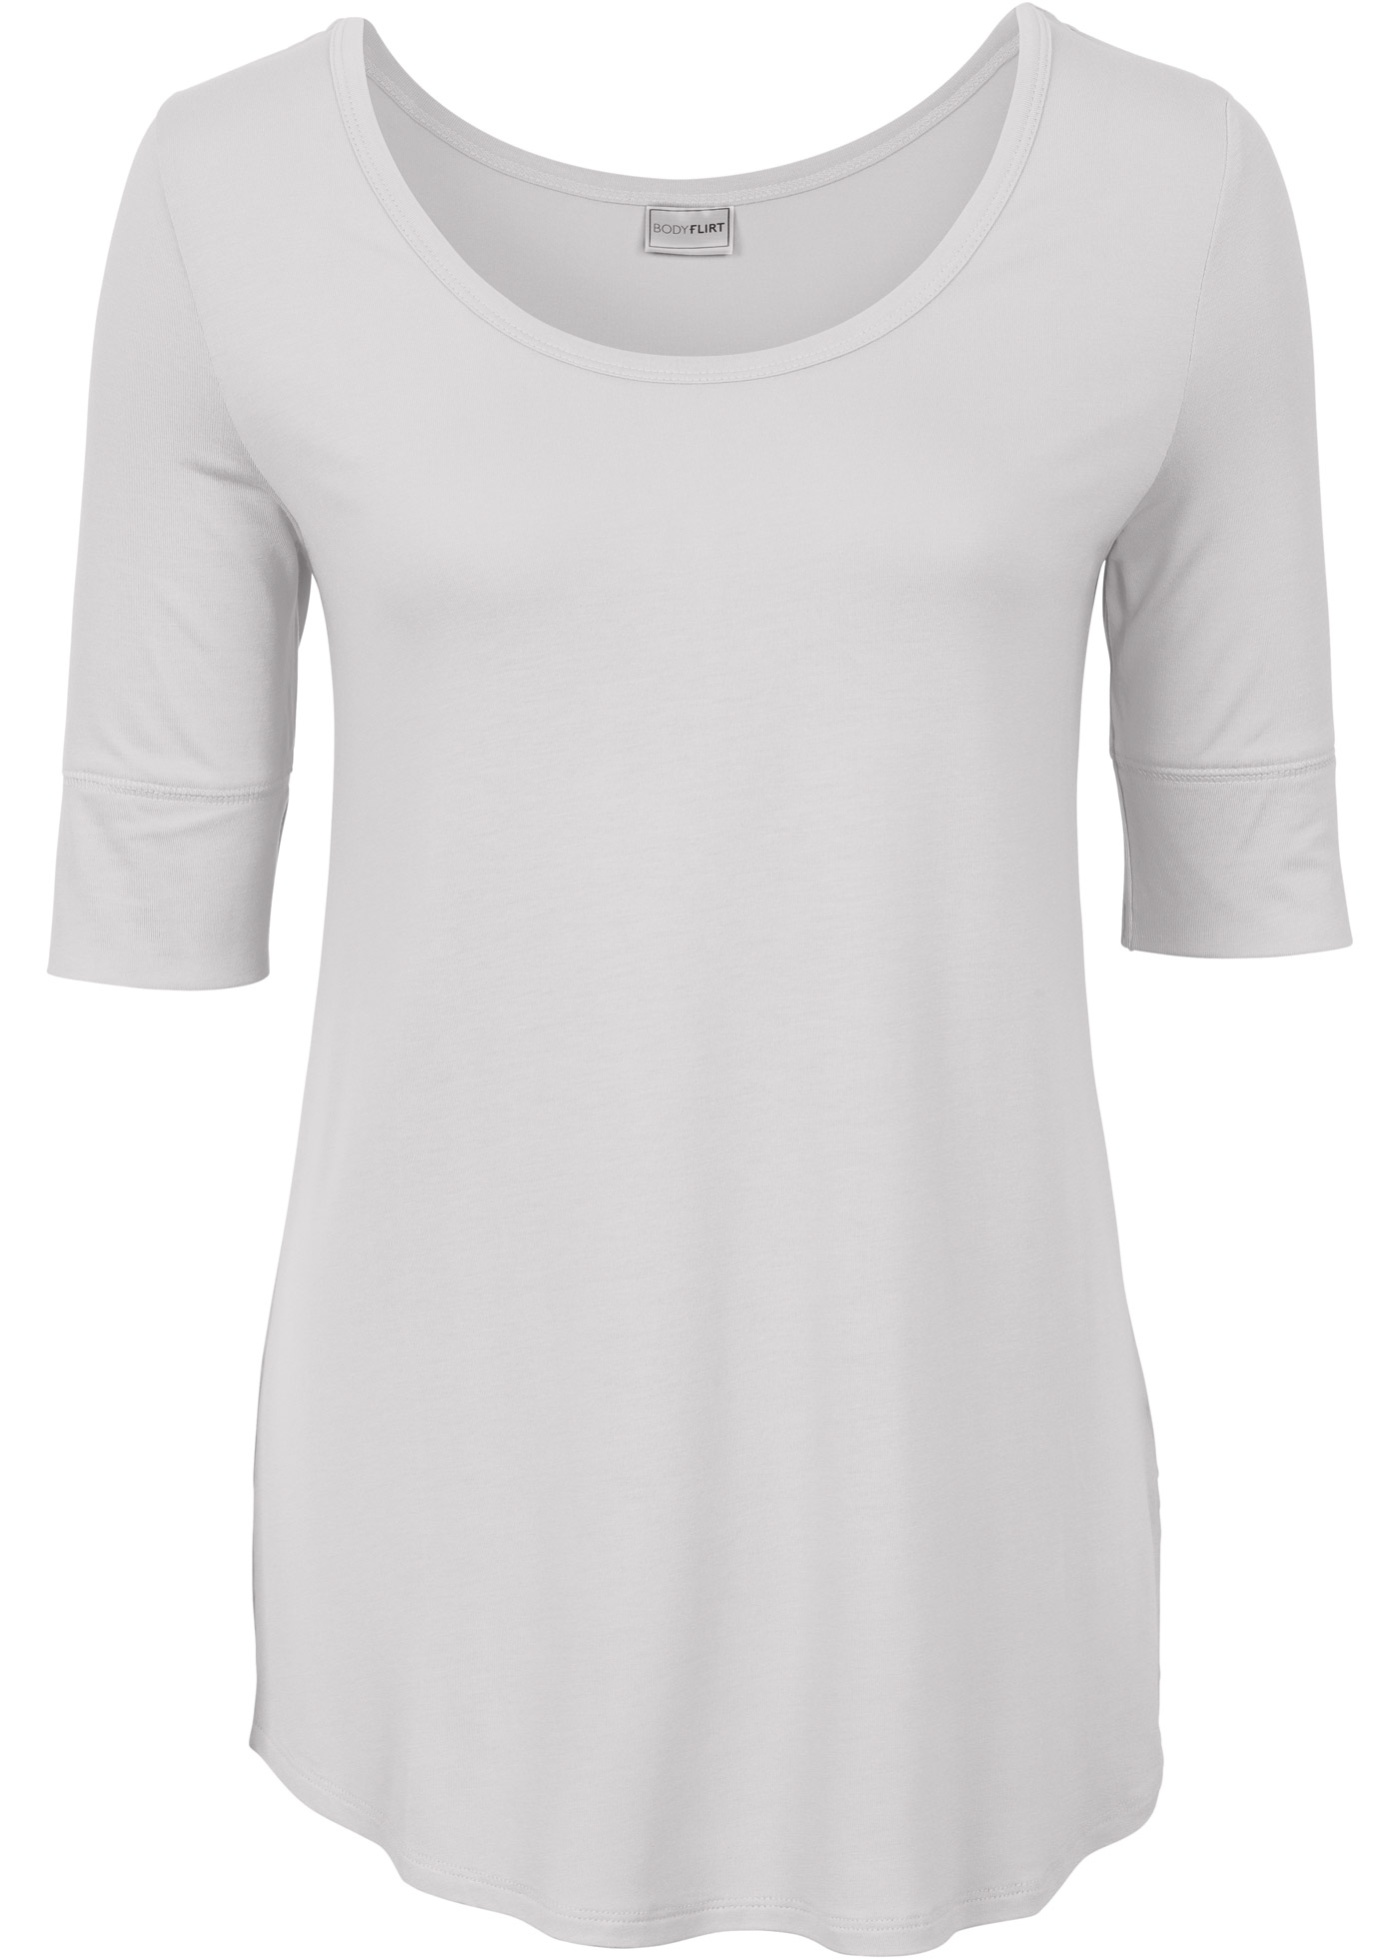 Bodyflirt Pour 3 BonprixT 4 shirt Gris Manches Femme PiOkuTZwXl